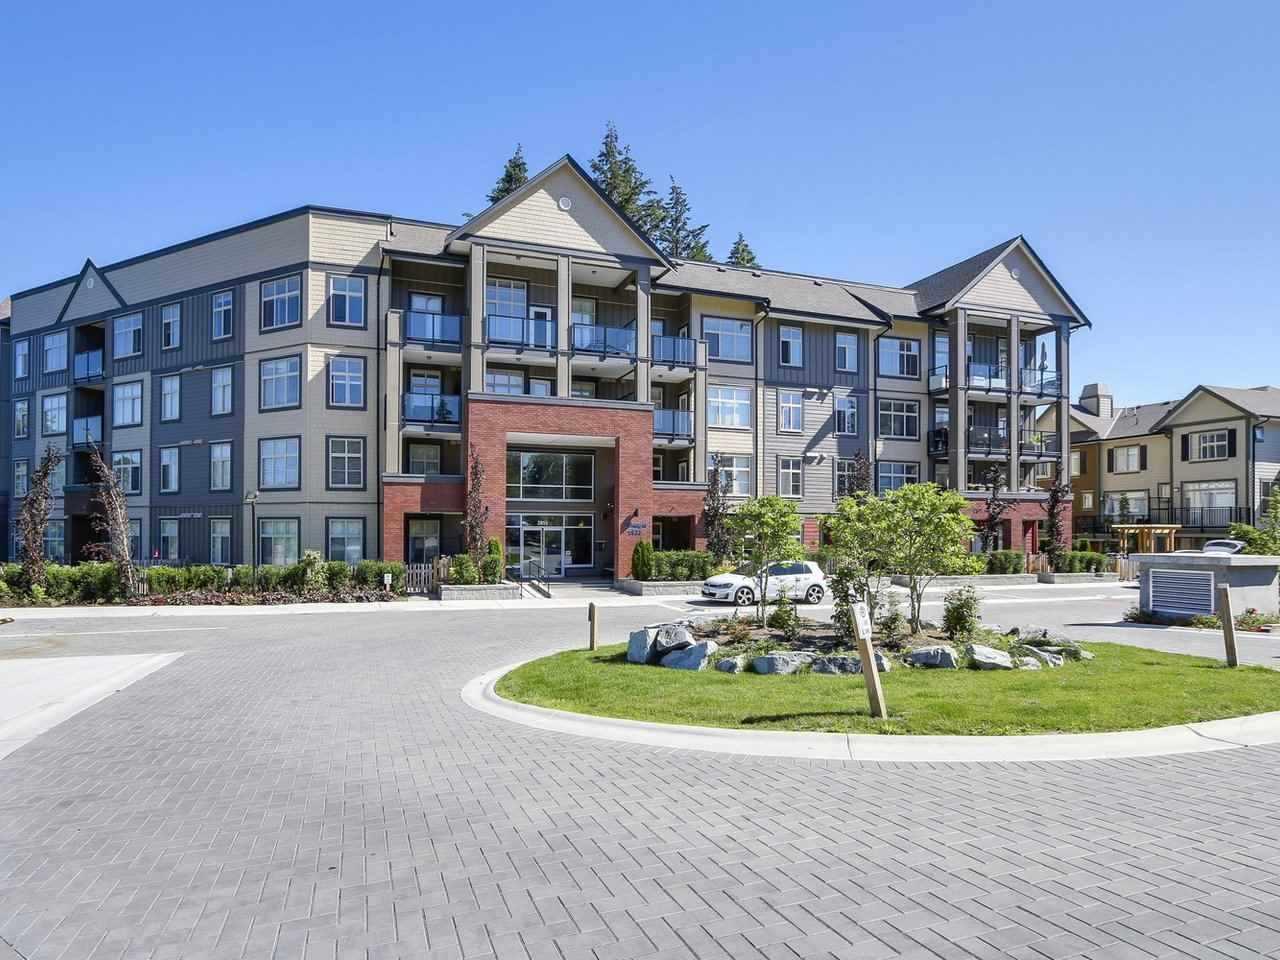 Condo Apartment at 106 2855 156 STREET, Unit 106, South Surrey White Rock, British Columbia. Image 1